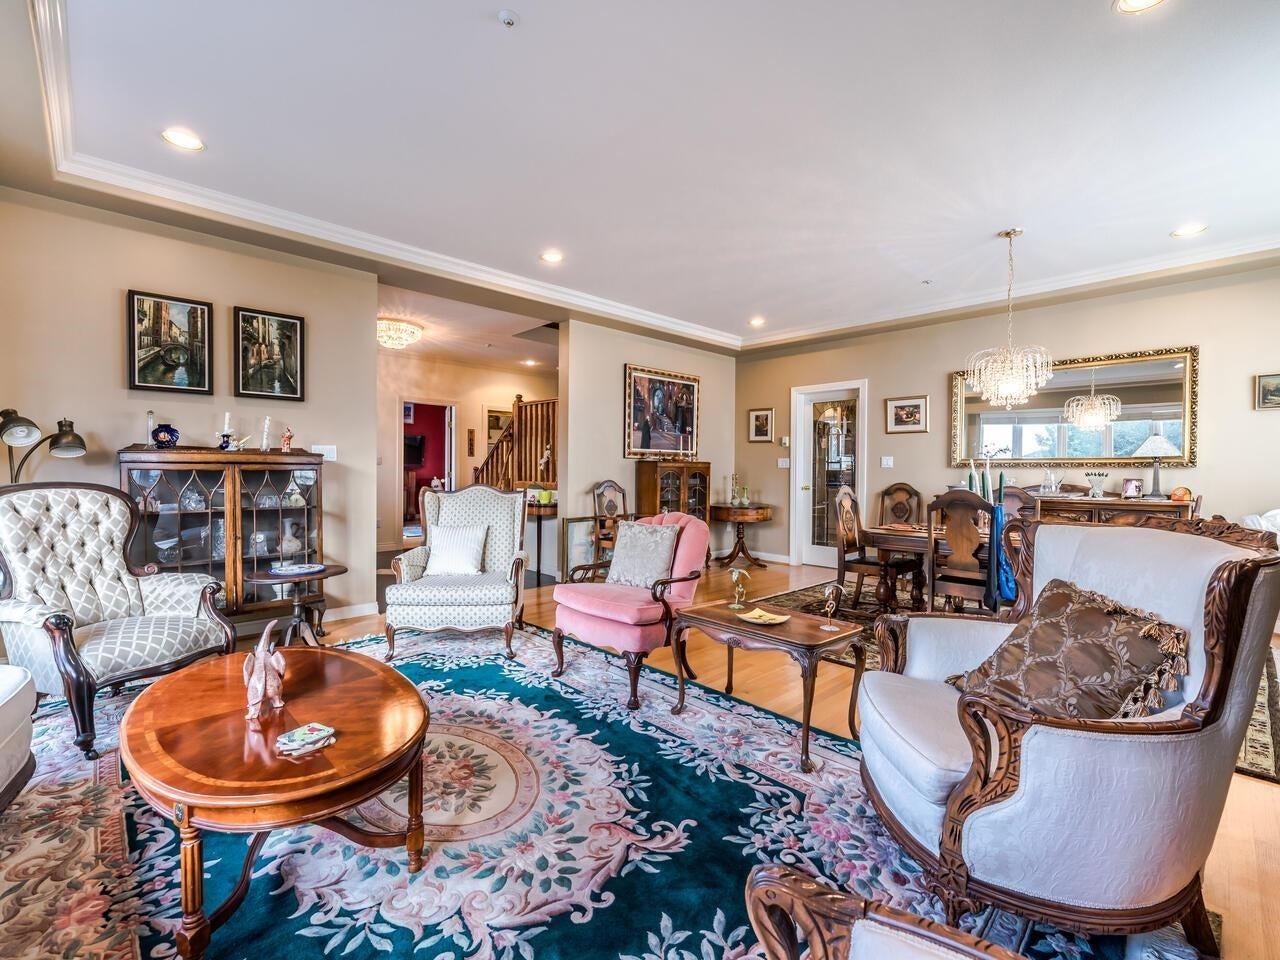 7888 JASPER CRESCENT - Fraserview VE House/Single Family for sale, 7 Bedrooms (R2622945) - #6